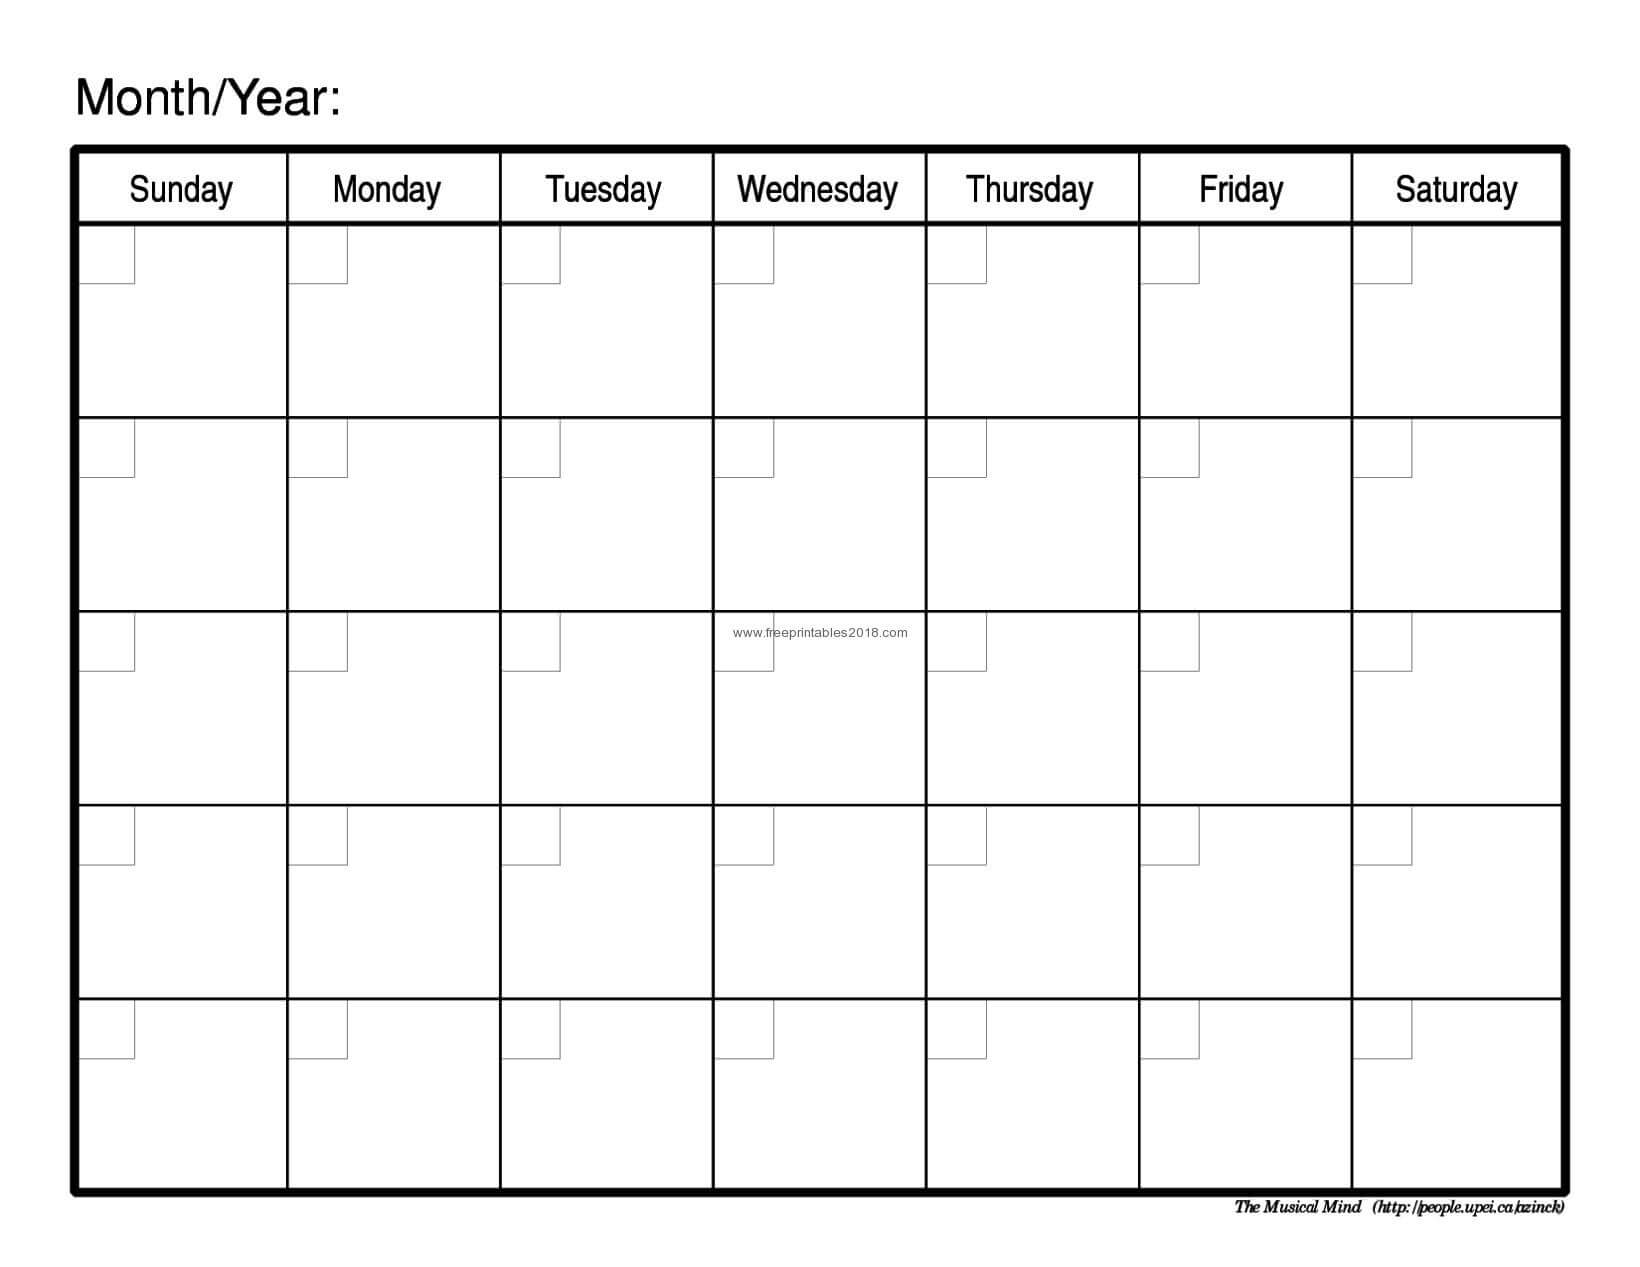 Blank Calendar Template - Zohre.horizonconsulting.co Intended For Blank Calender Template